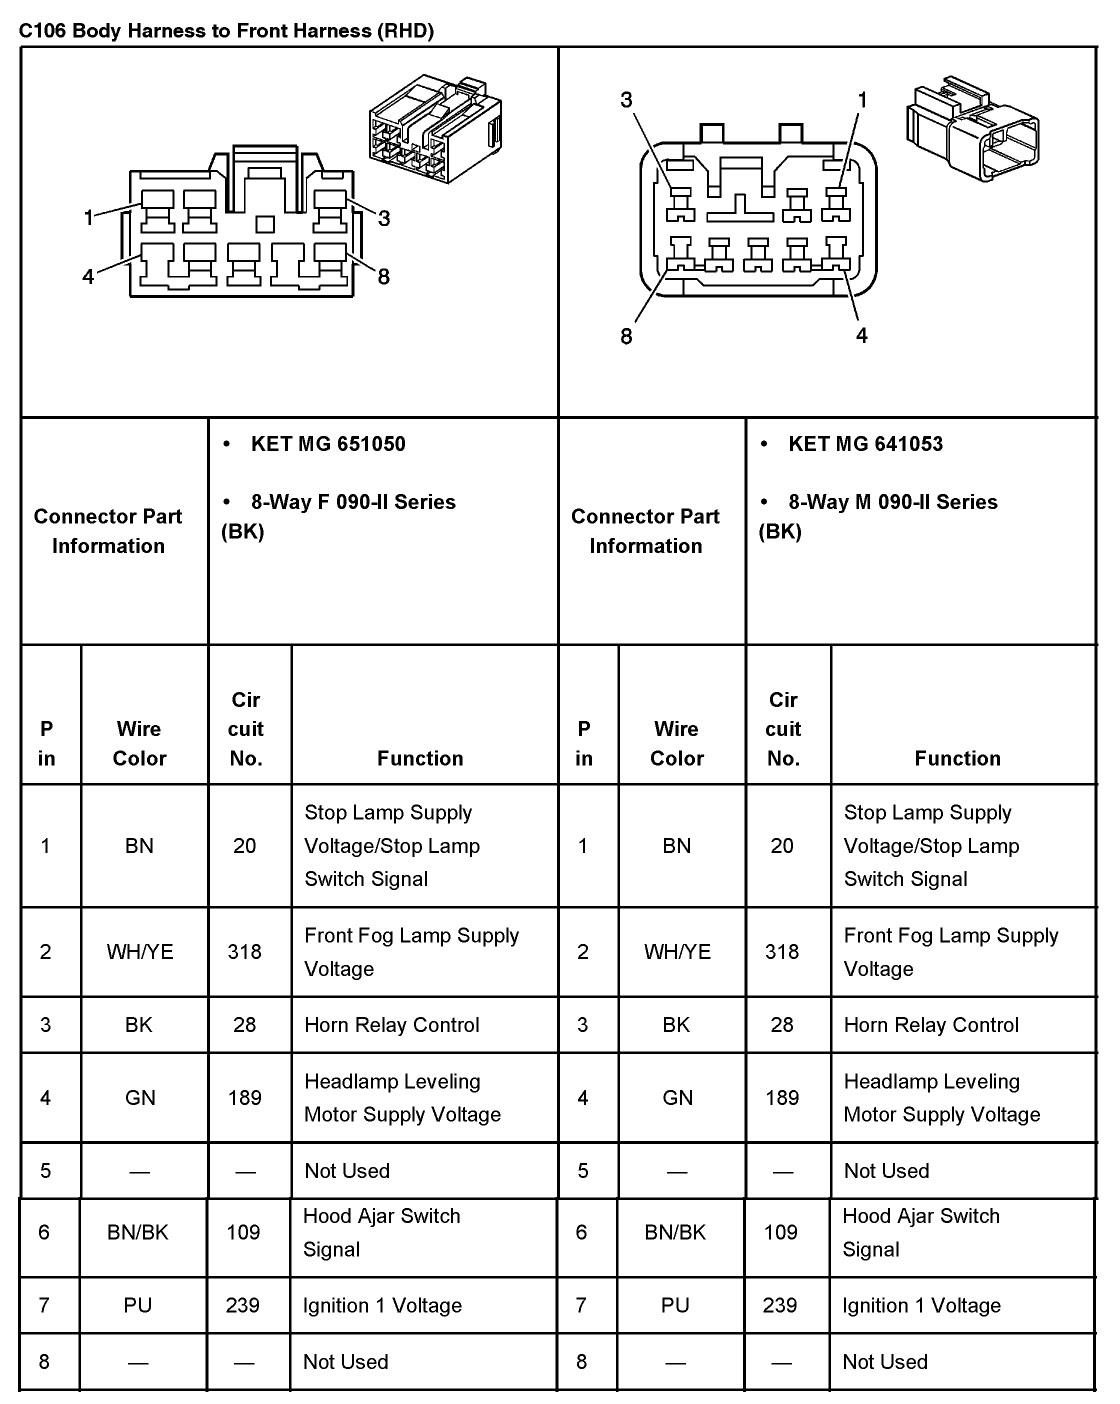 Tremendous 2006 Chevy Aveo Fuse Box Diagram Basic Electronics Wiring Diagram Wiring Cloud Hisonepsysticxongrecoveryedborg